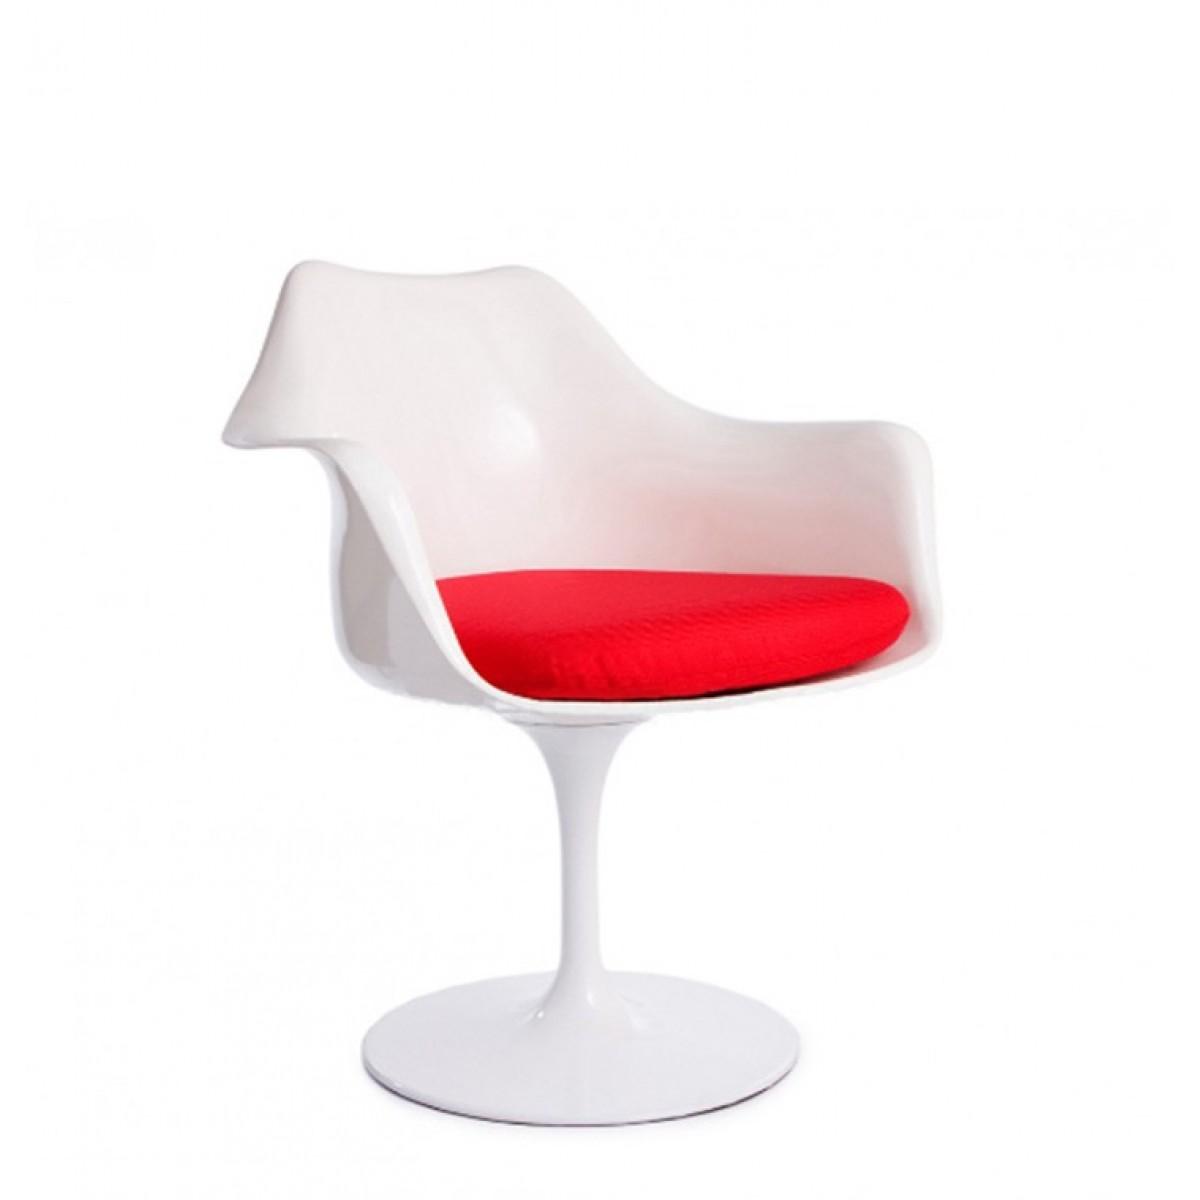 Eero Saarinen Style Tulip Arm Chair White Replica